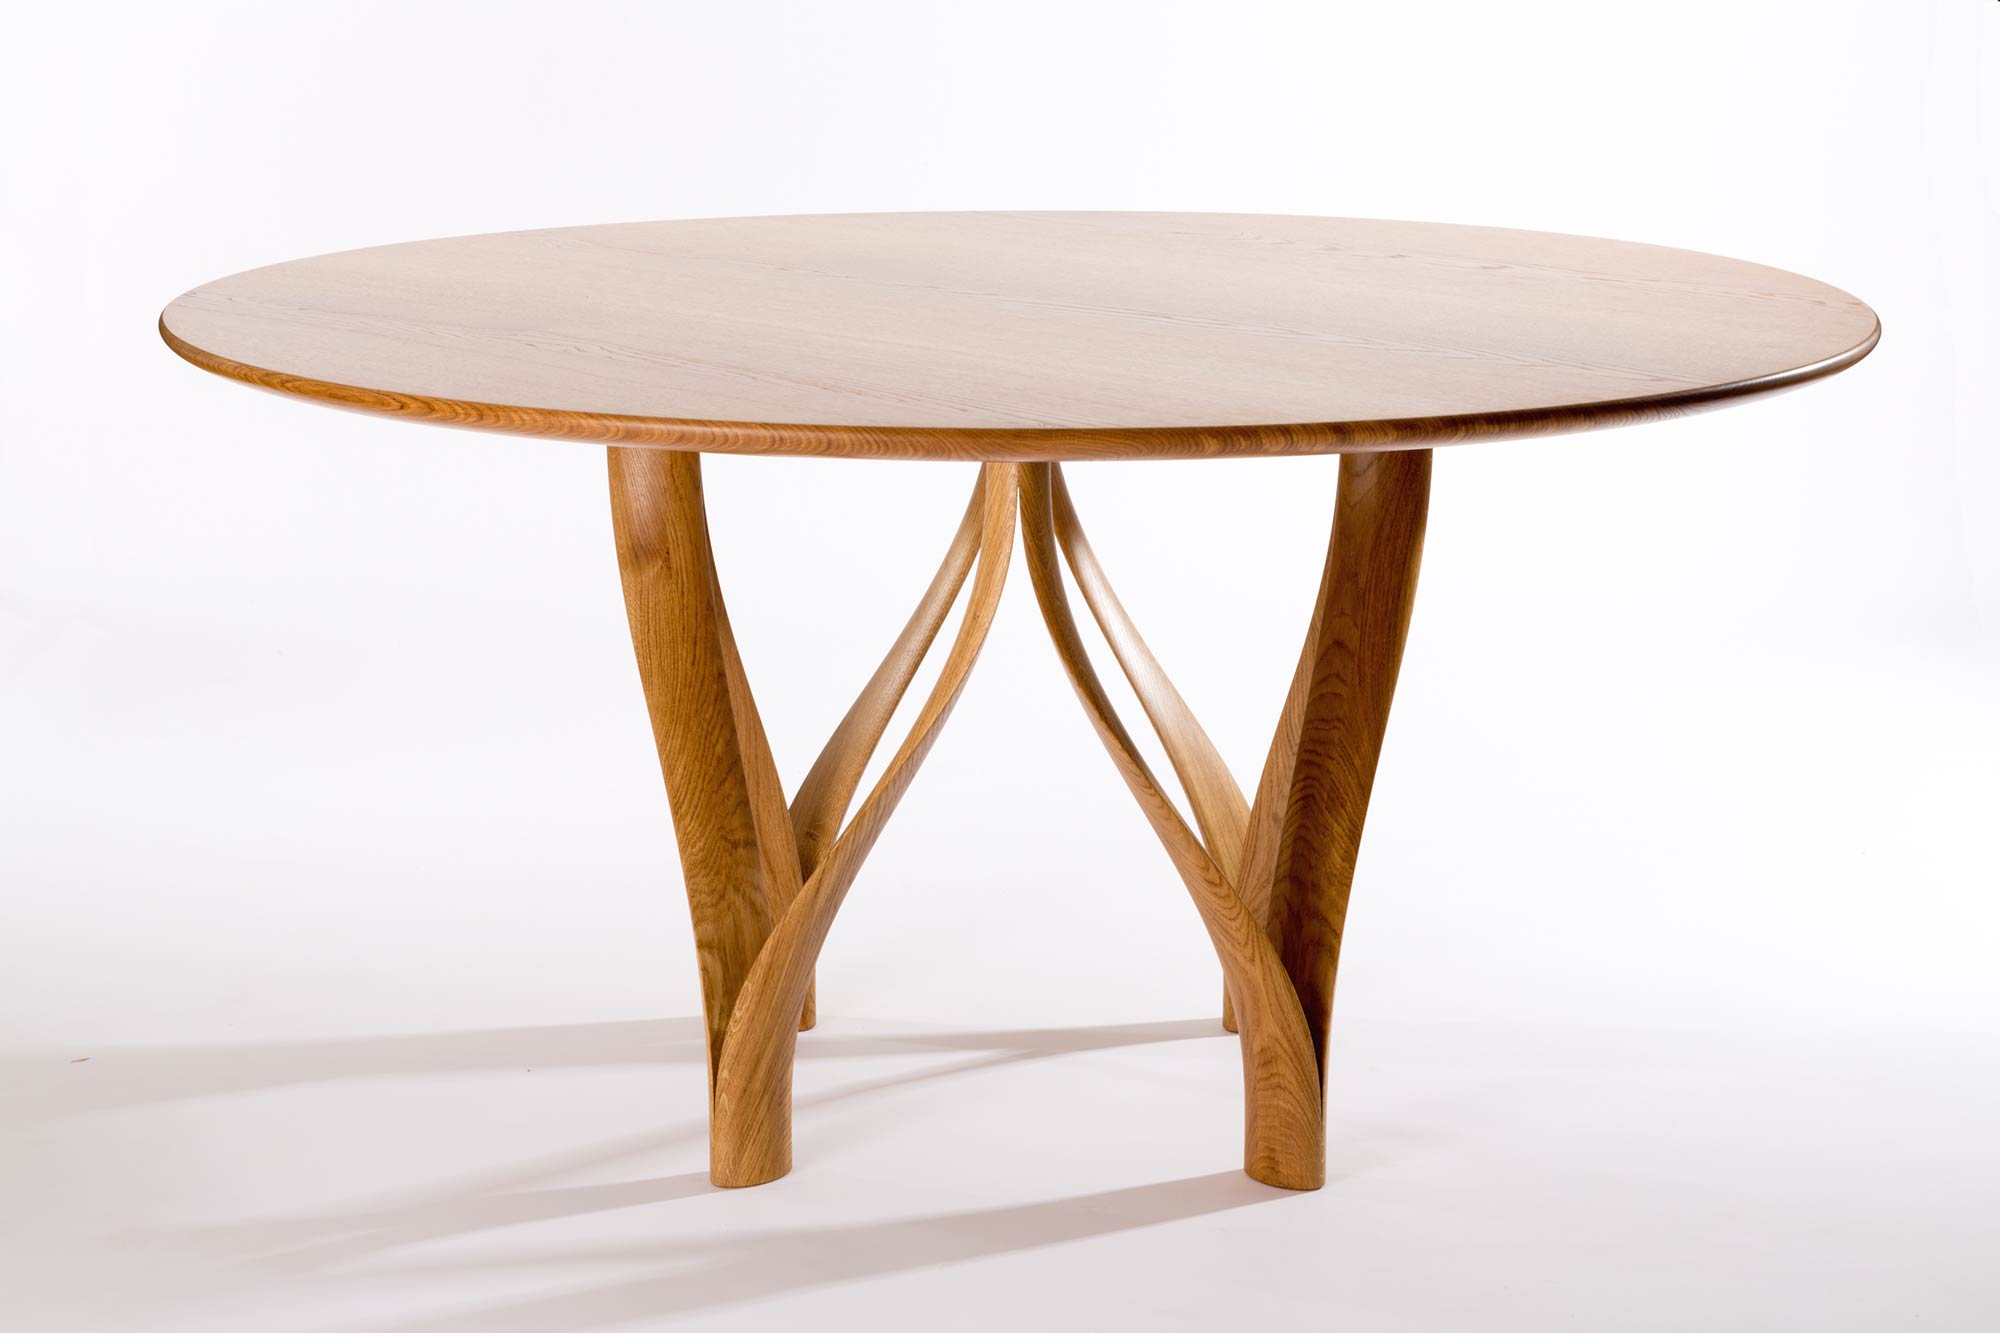 Oak Circular Dining Table Oak Extending Dining Table  : ribbon oak table large03 from amlibgroup.com size 2000 x 1333 jpeg 98kB